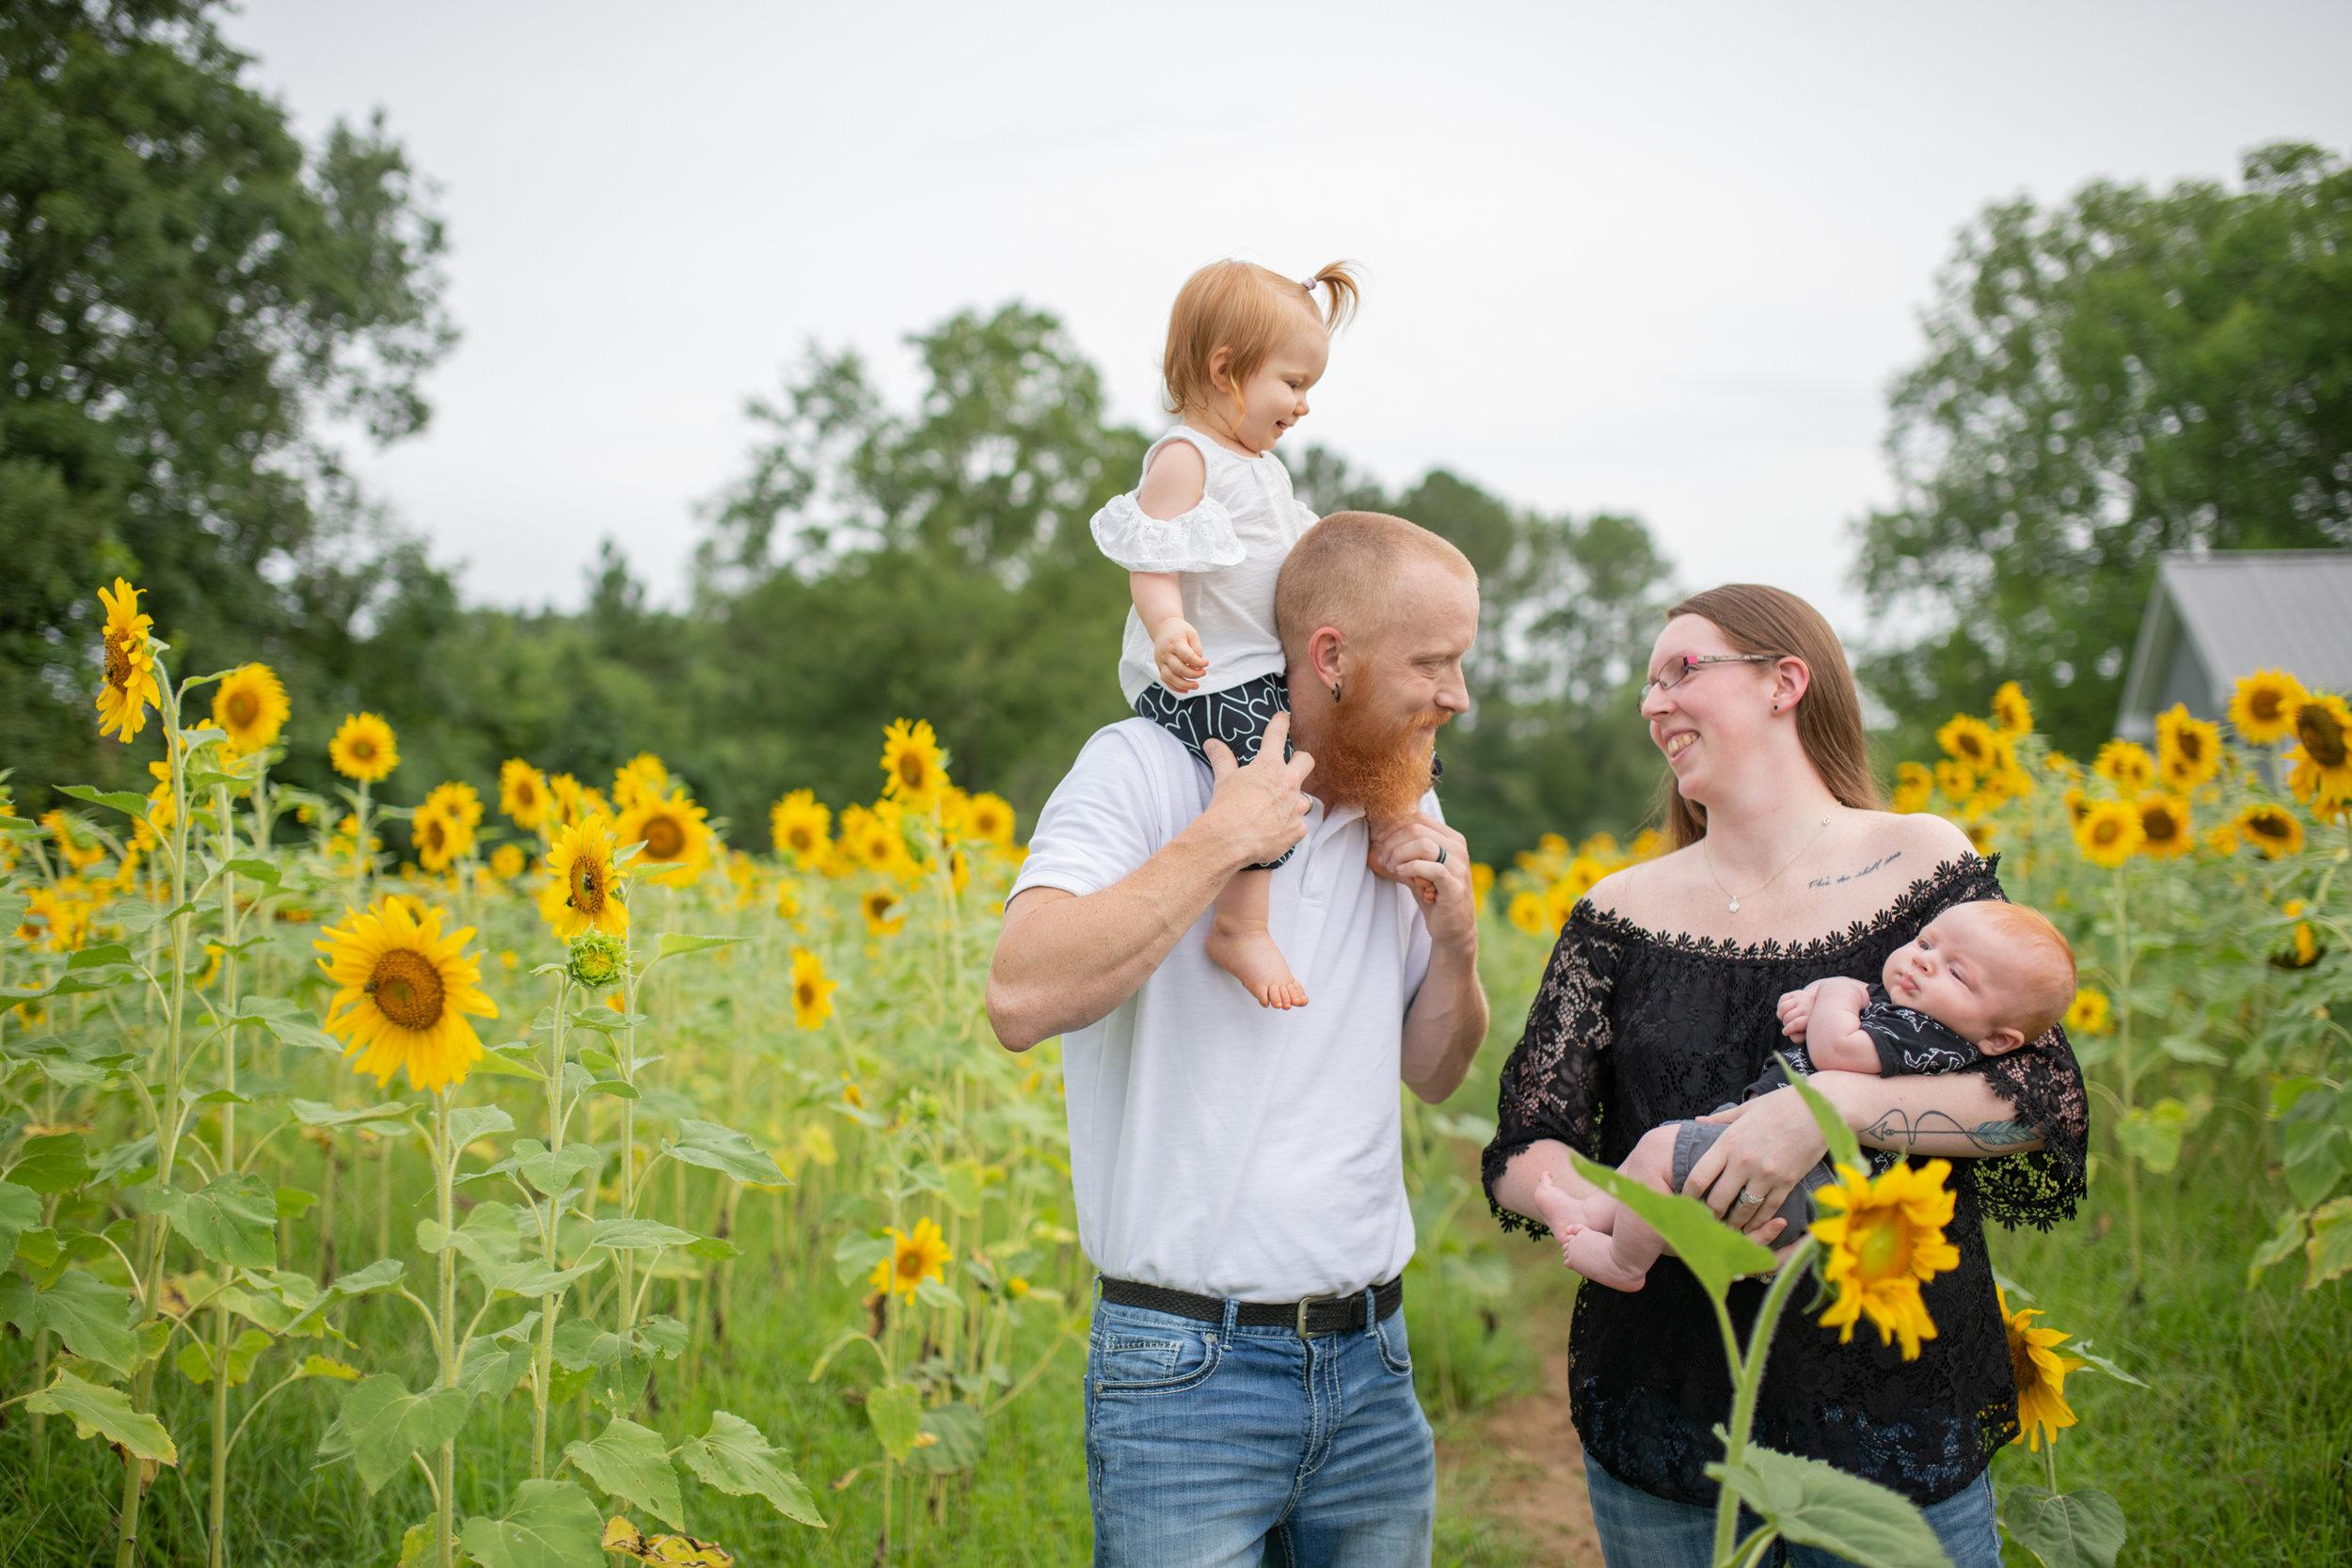 Sunflowers-Favs-7.jpg